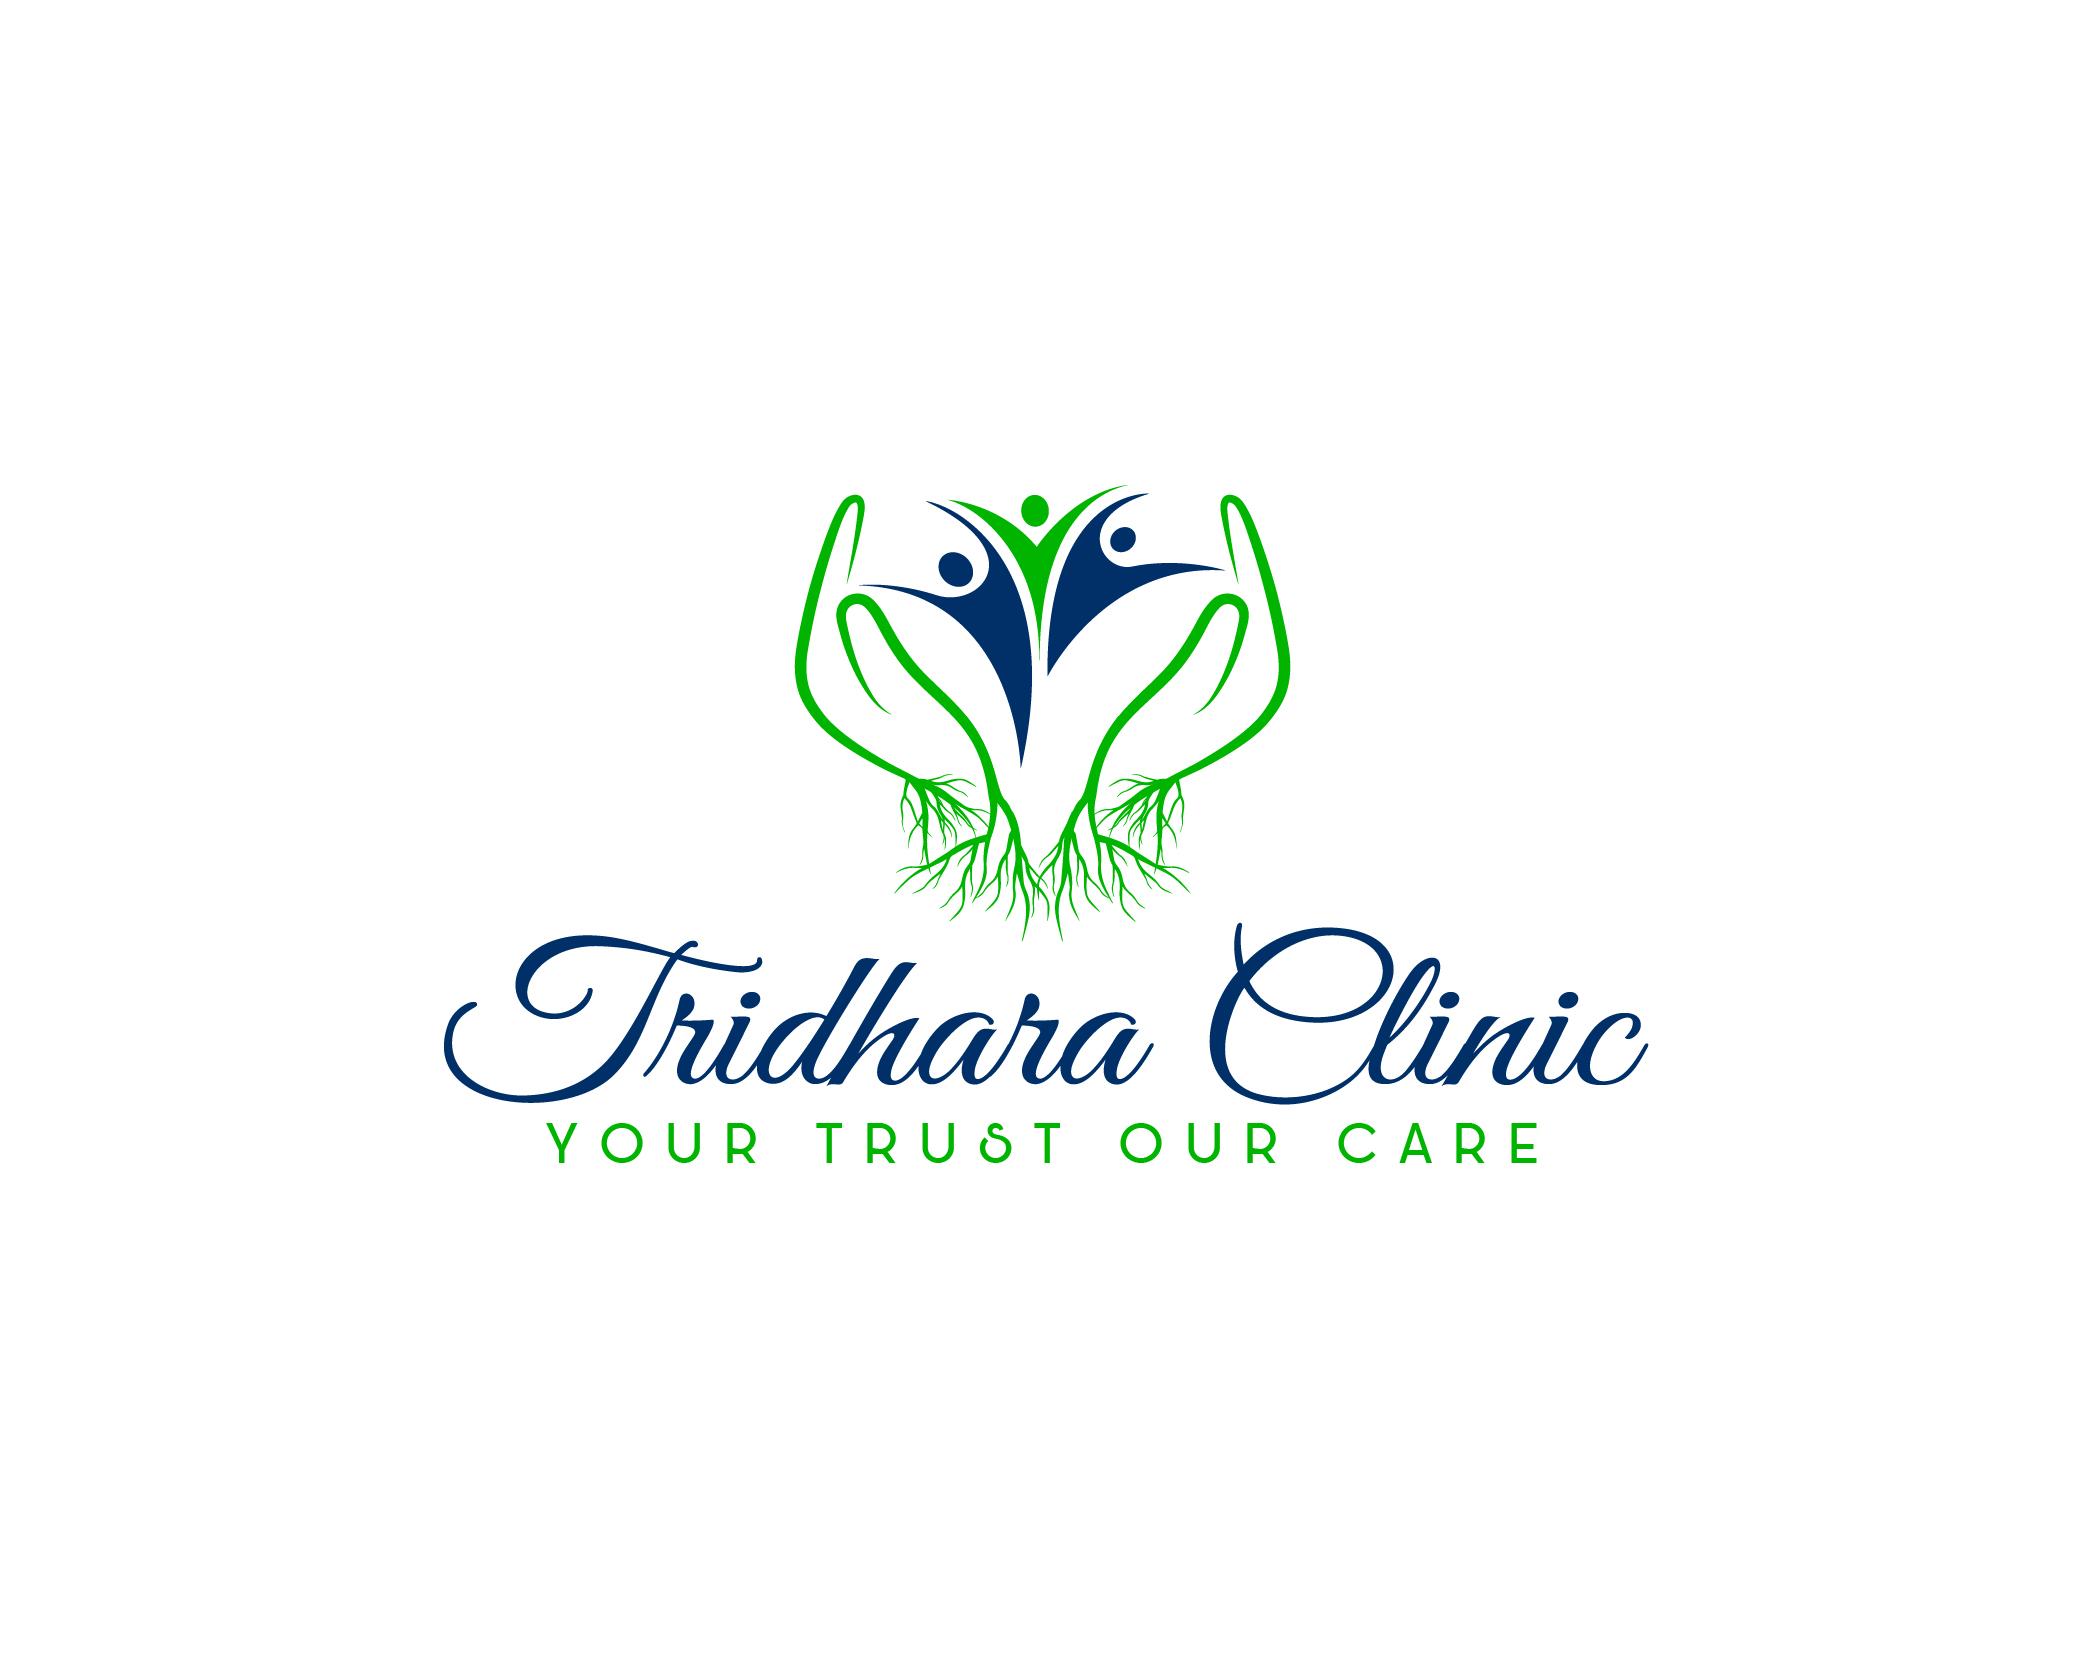 Tridhara Multi-Speciality Centre, Kolkata